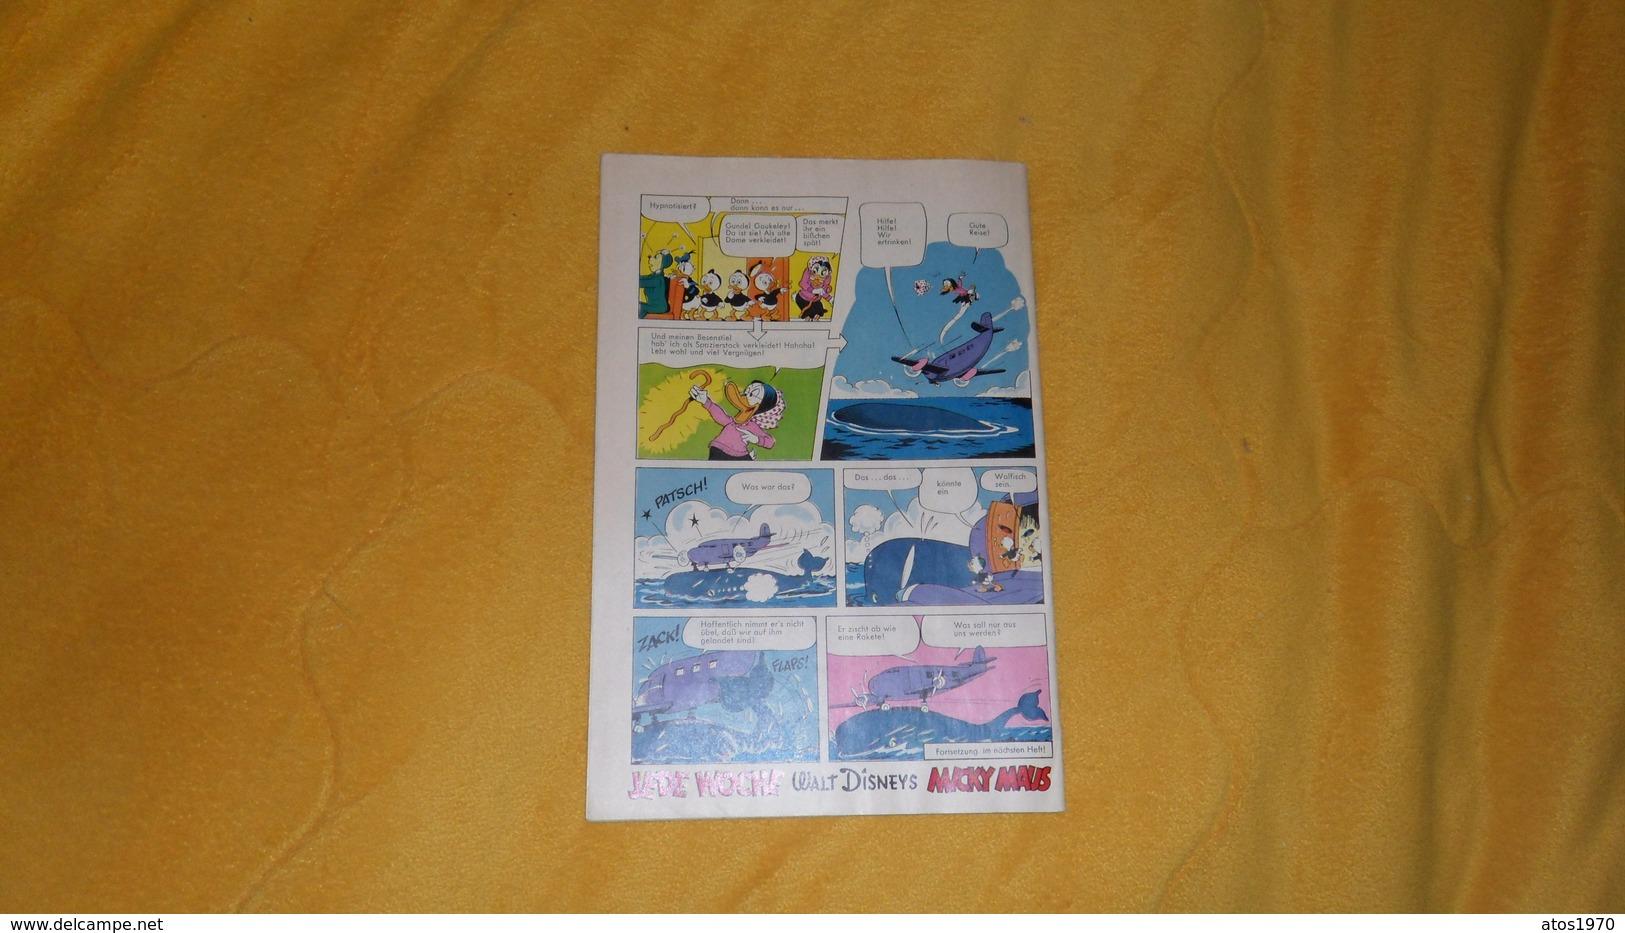 BANDE DESSINEE MICKY MAUS WALT DISNEYS 2 AUGUST 1969 N°31 / EN ALLEMAND. - Walt Disney